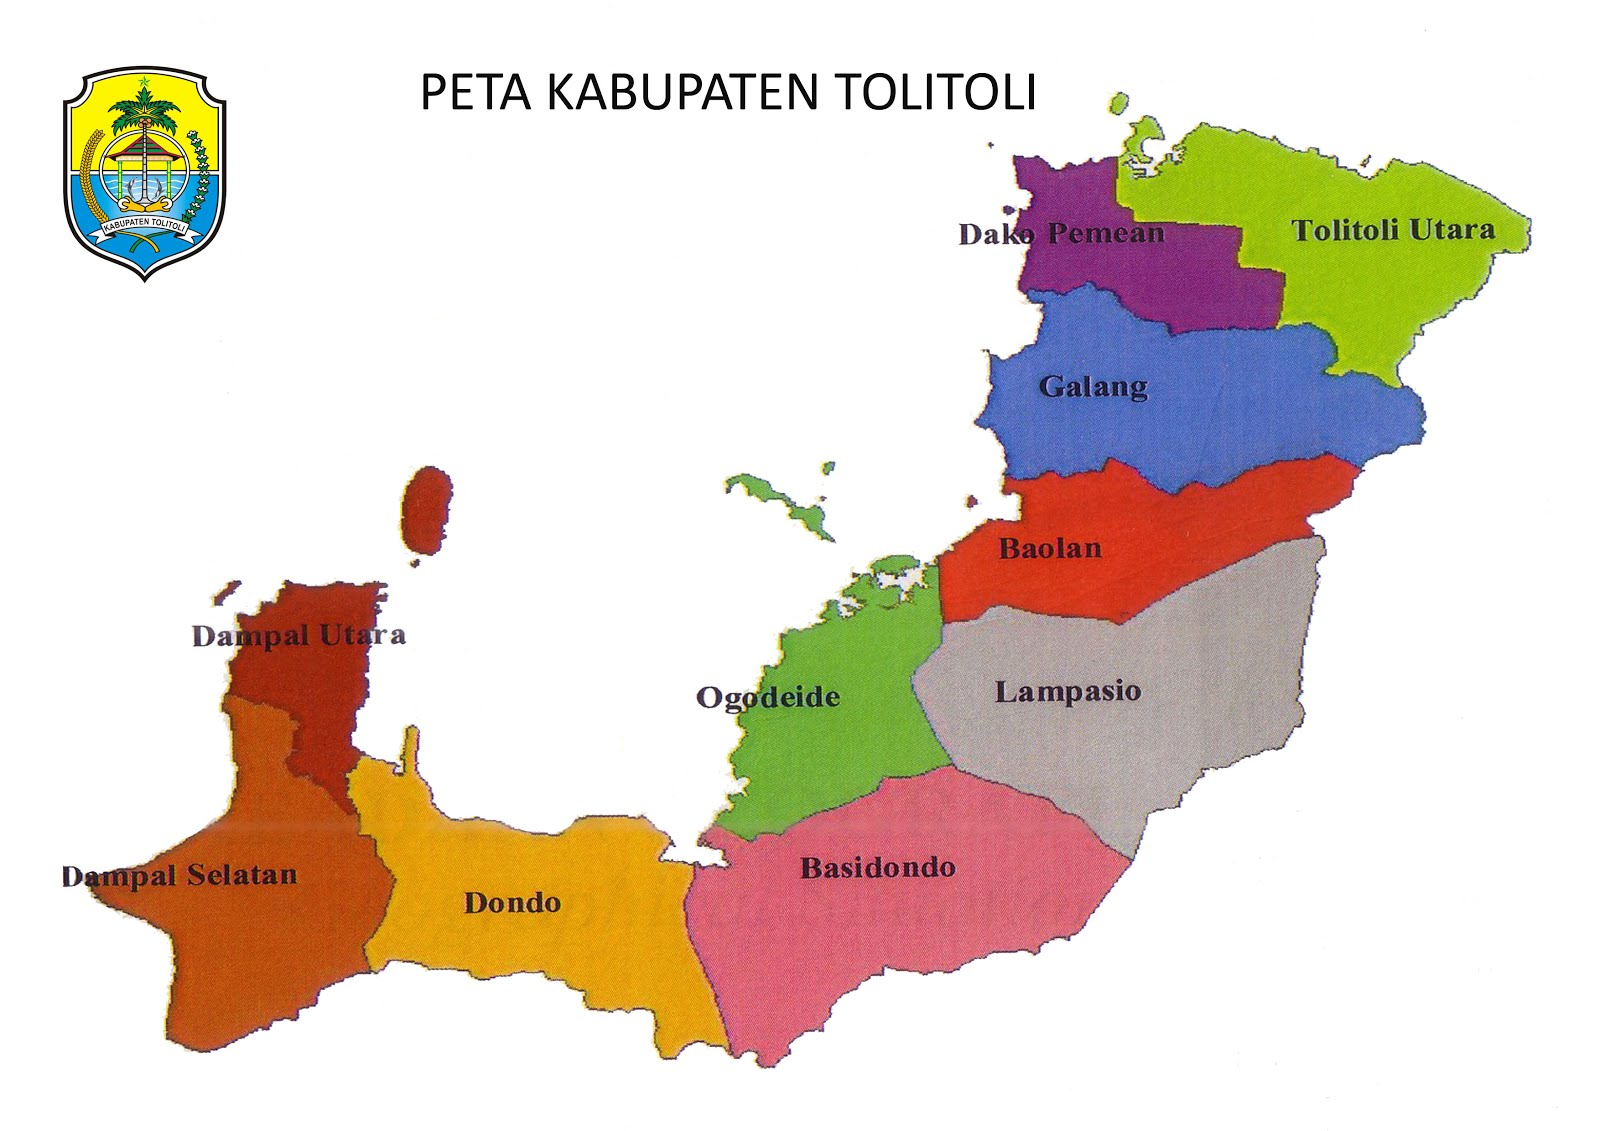 PETA KAB. TOLITOLI